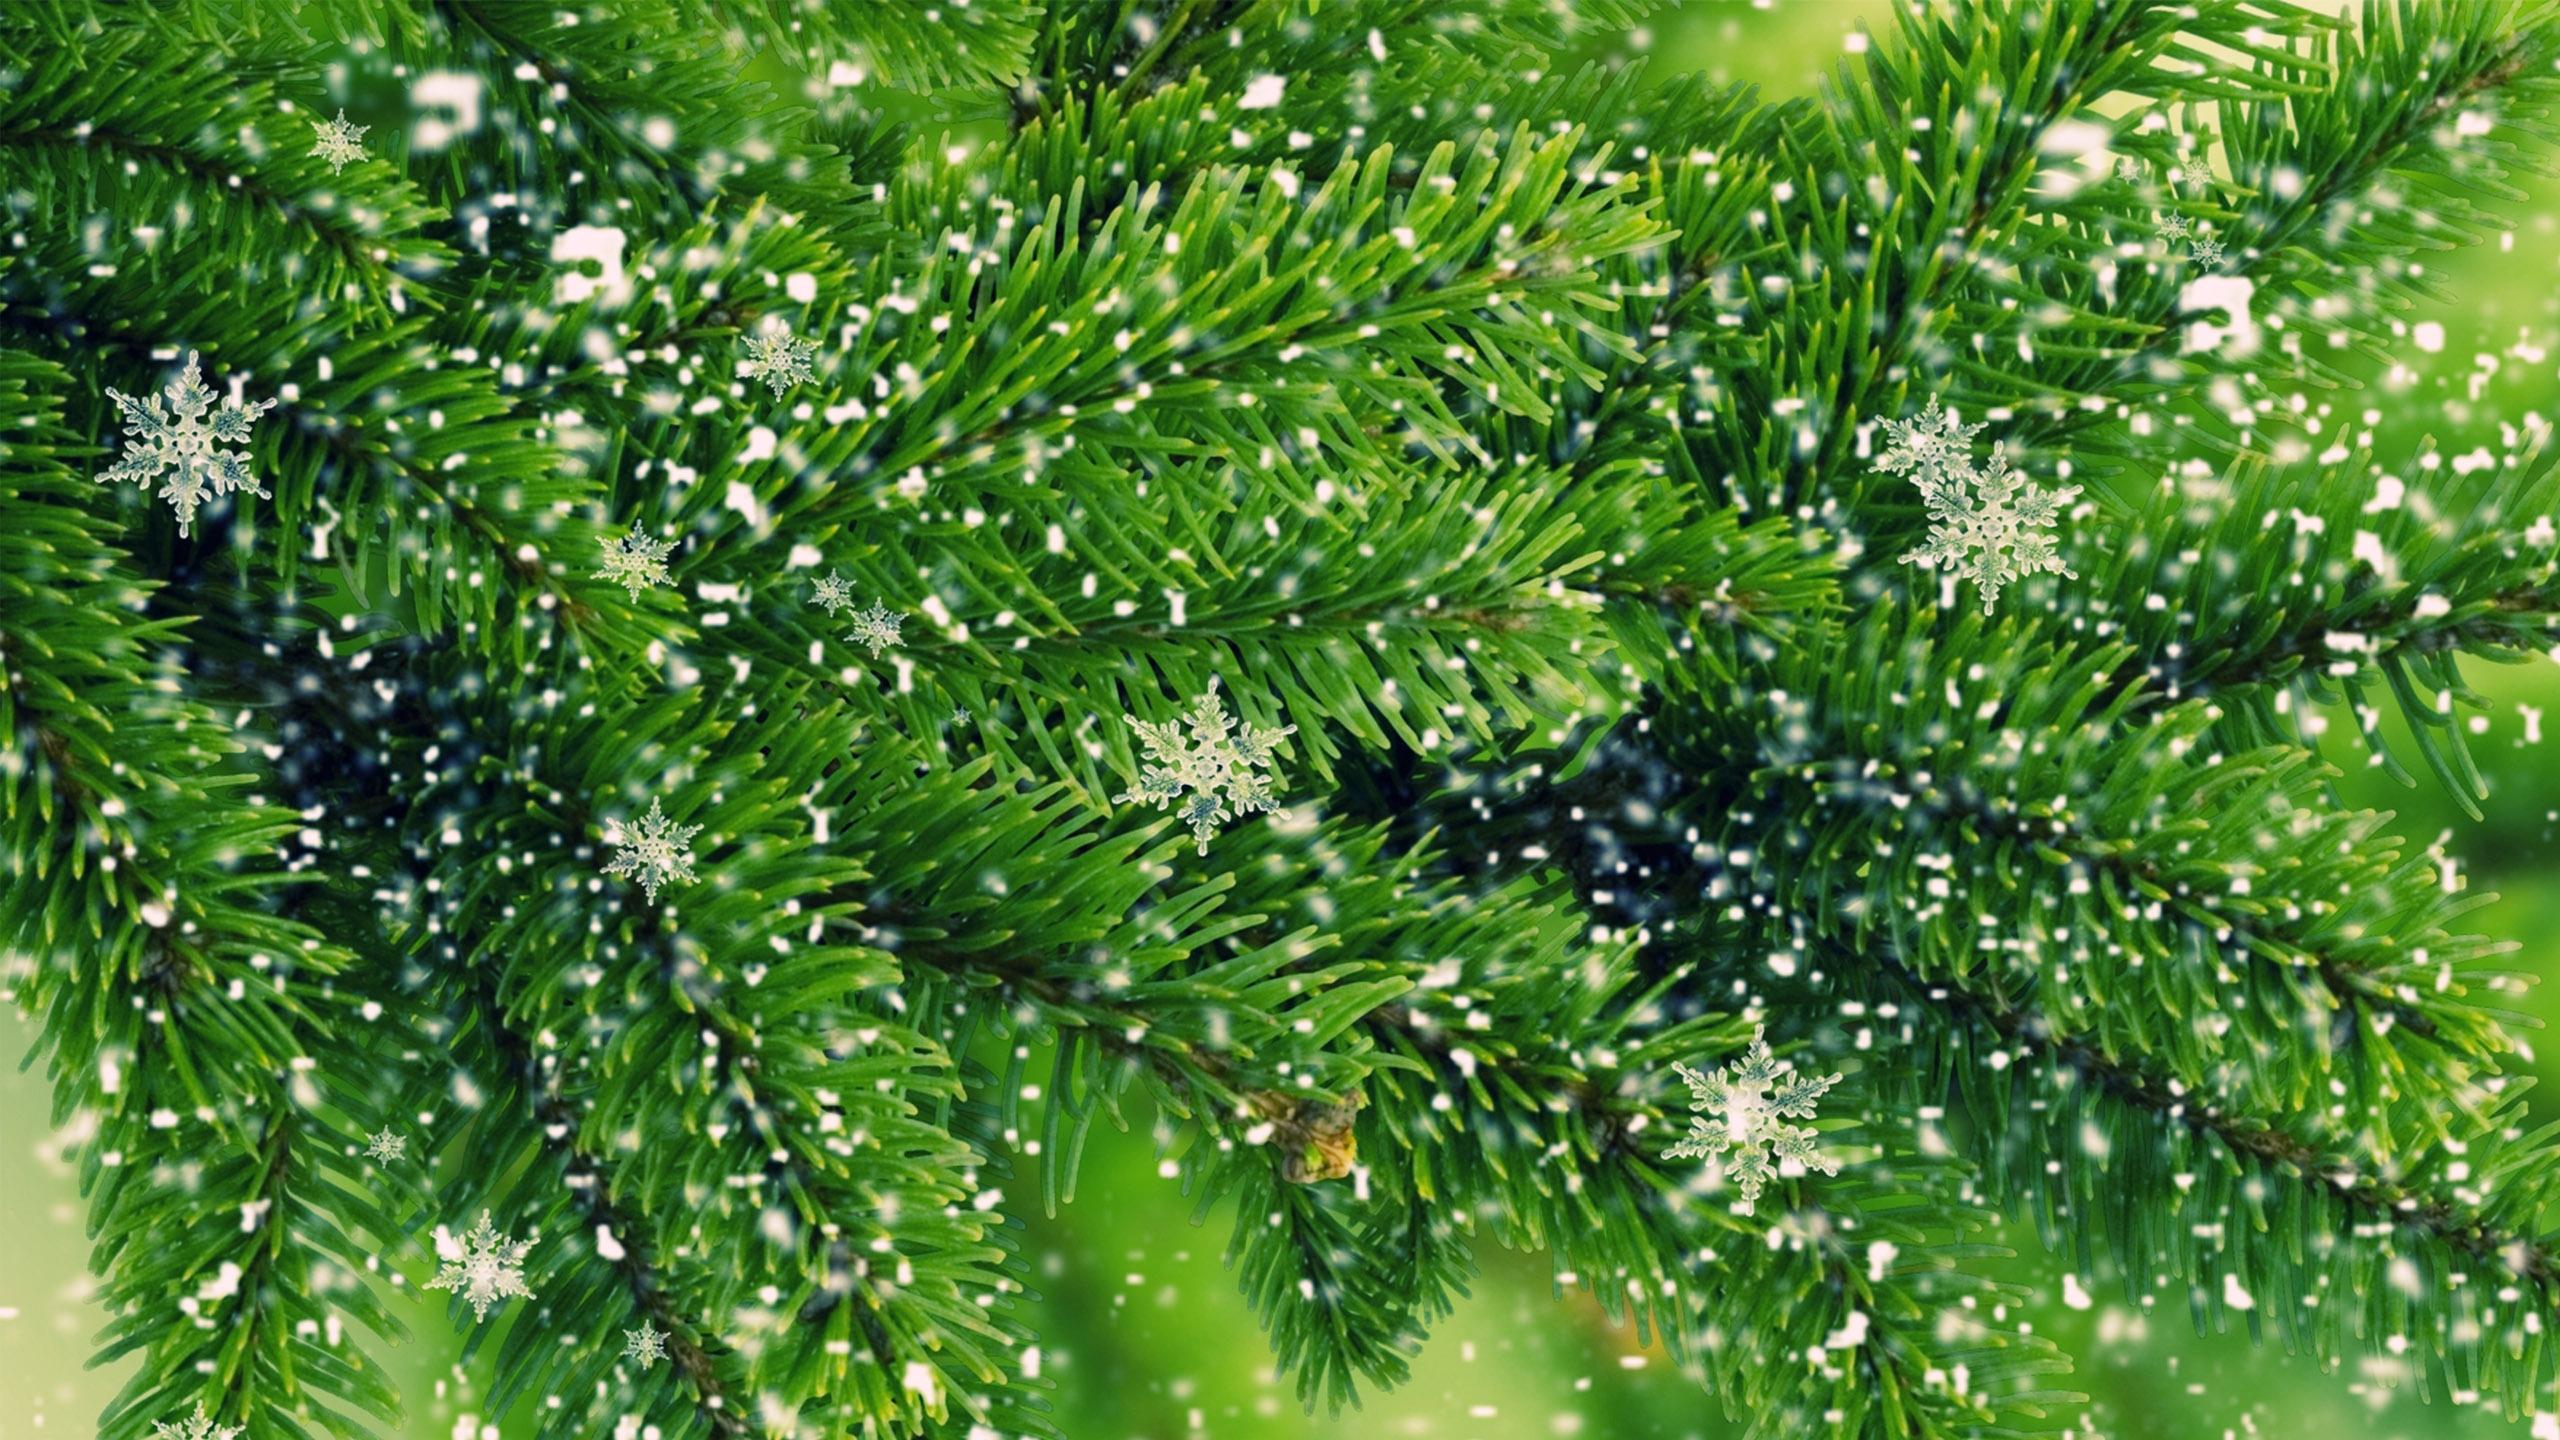 Cool 3d Wallpapers Nature Beautiful Pine Hd Desktop Wallpapers 4k Hd